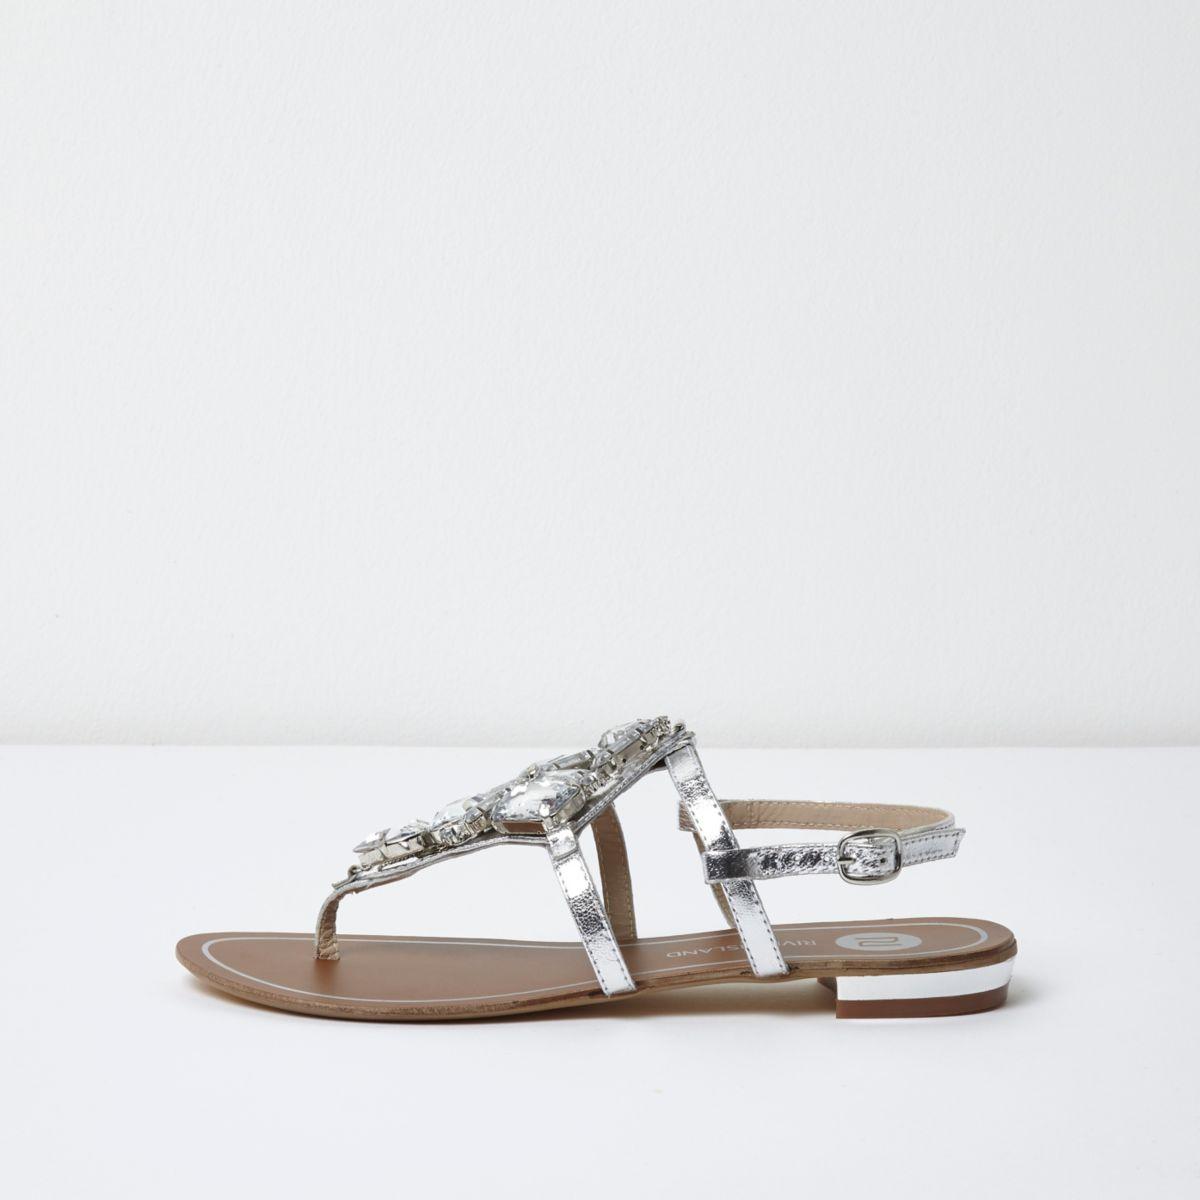 Silver metallic embellished flat sandals